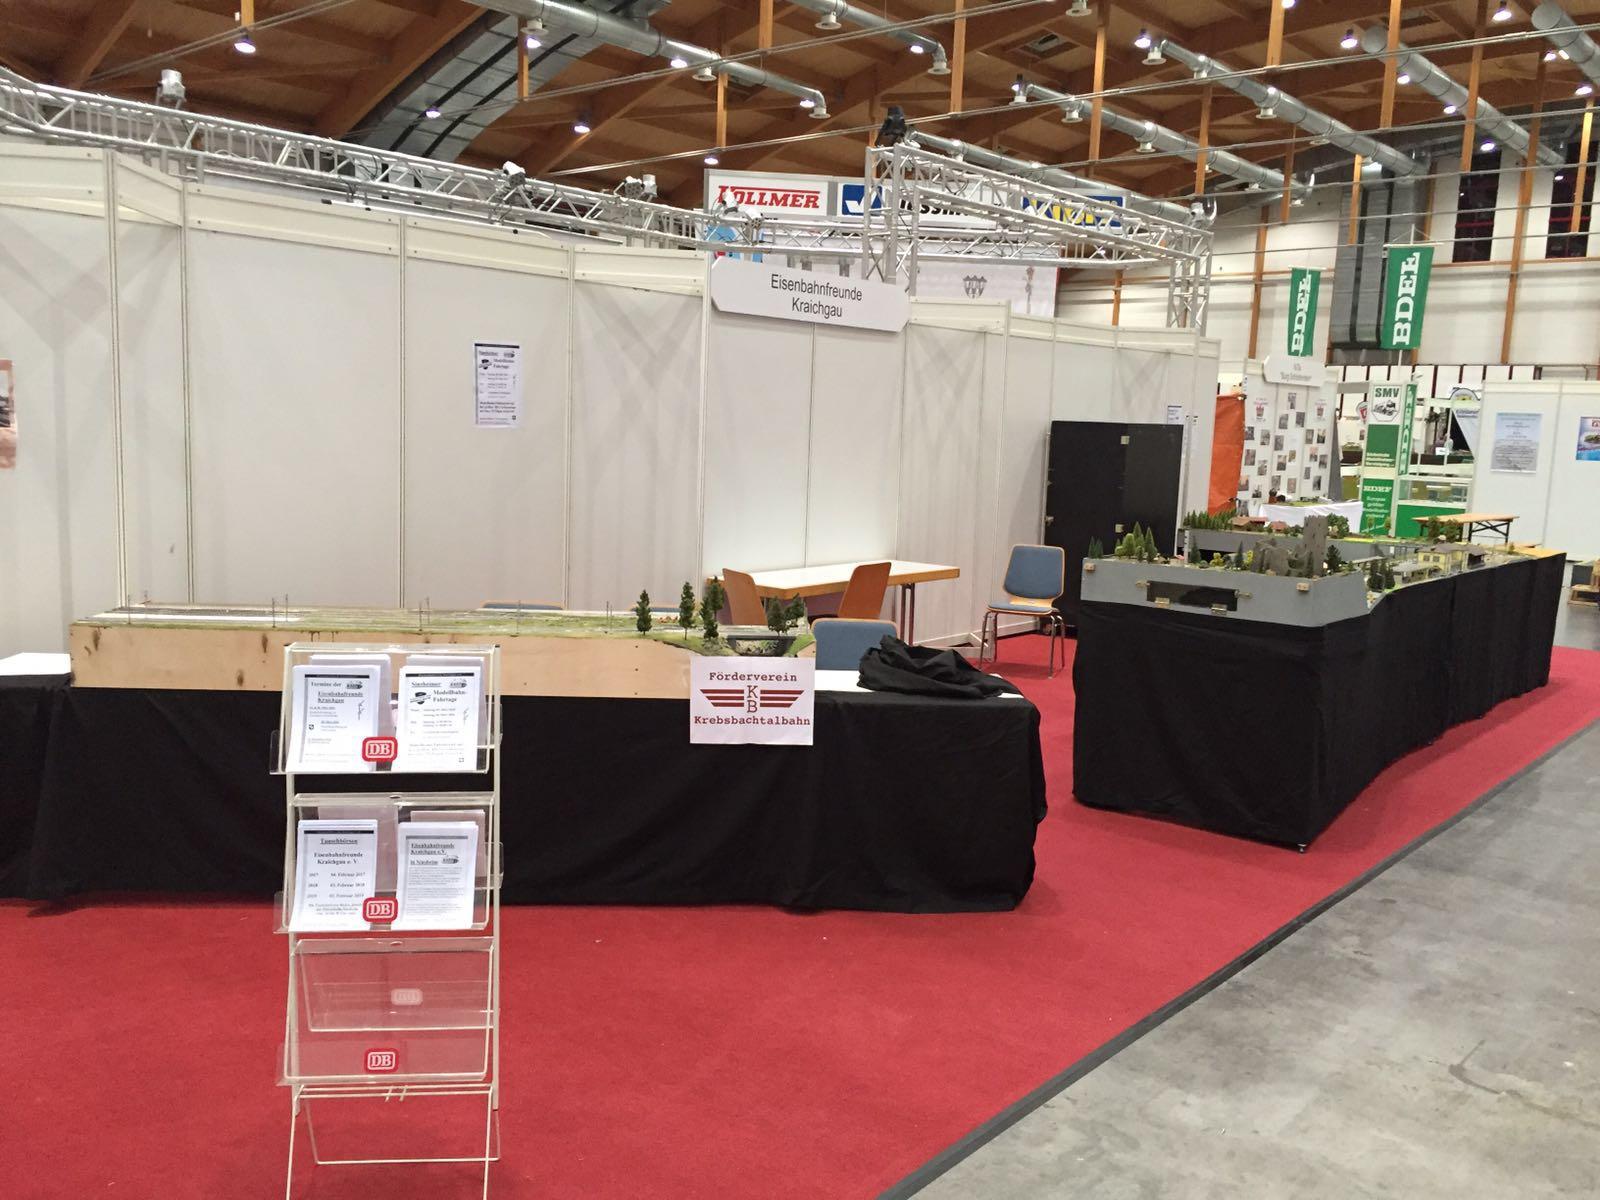 Eisenbahnfreunde Kraichgau Faszination Modellbahn 2016 Standaufbau Messe 02